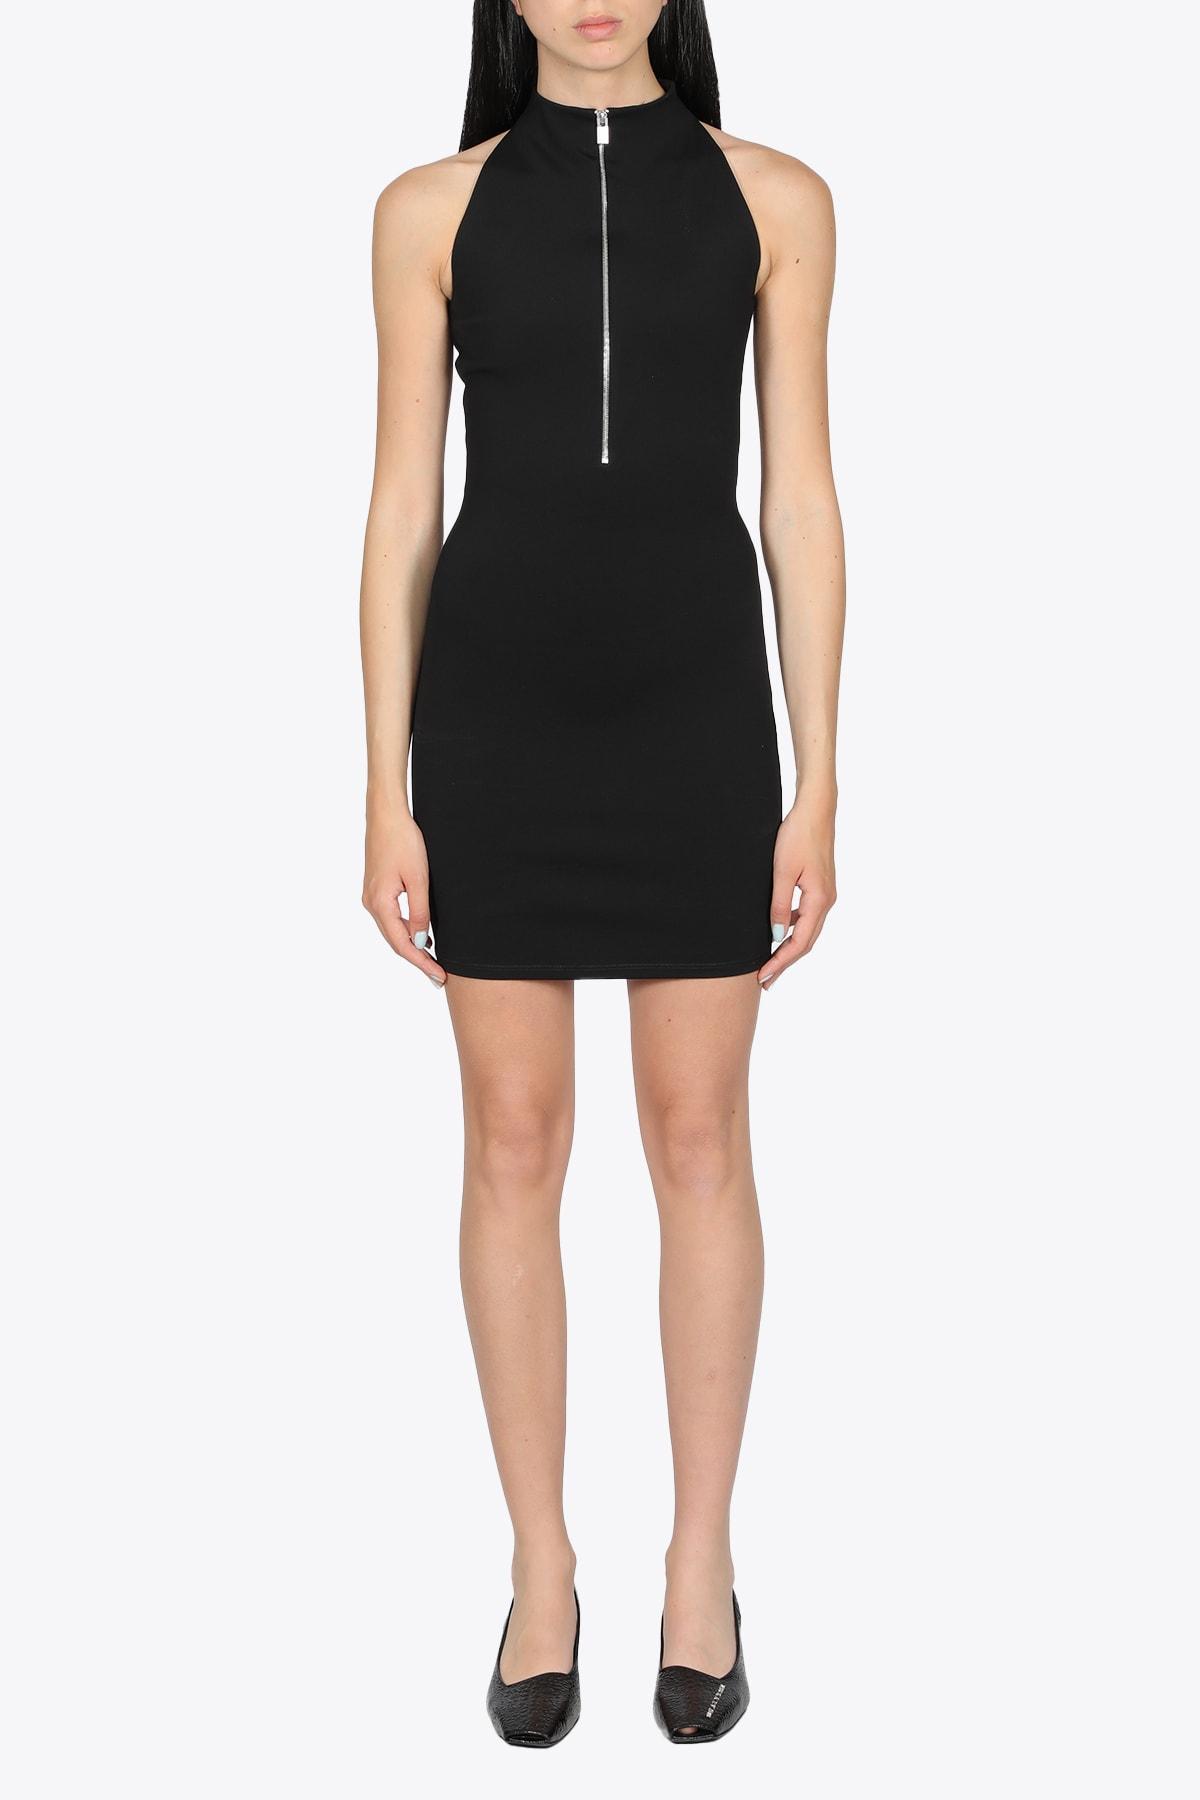 Buy 1017 ALYX 9SM Racerback Sport Dress online, shop 1017 ALYX 9SM with free shipping